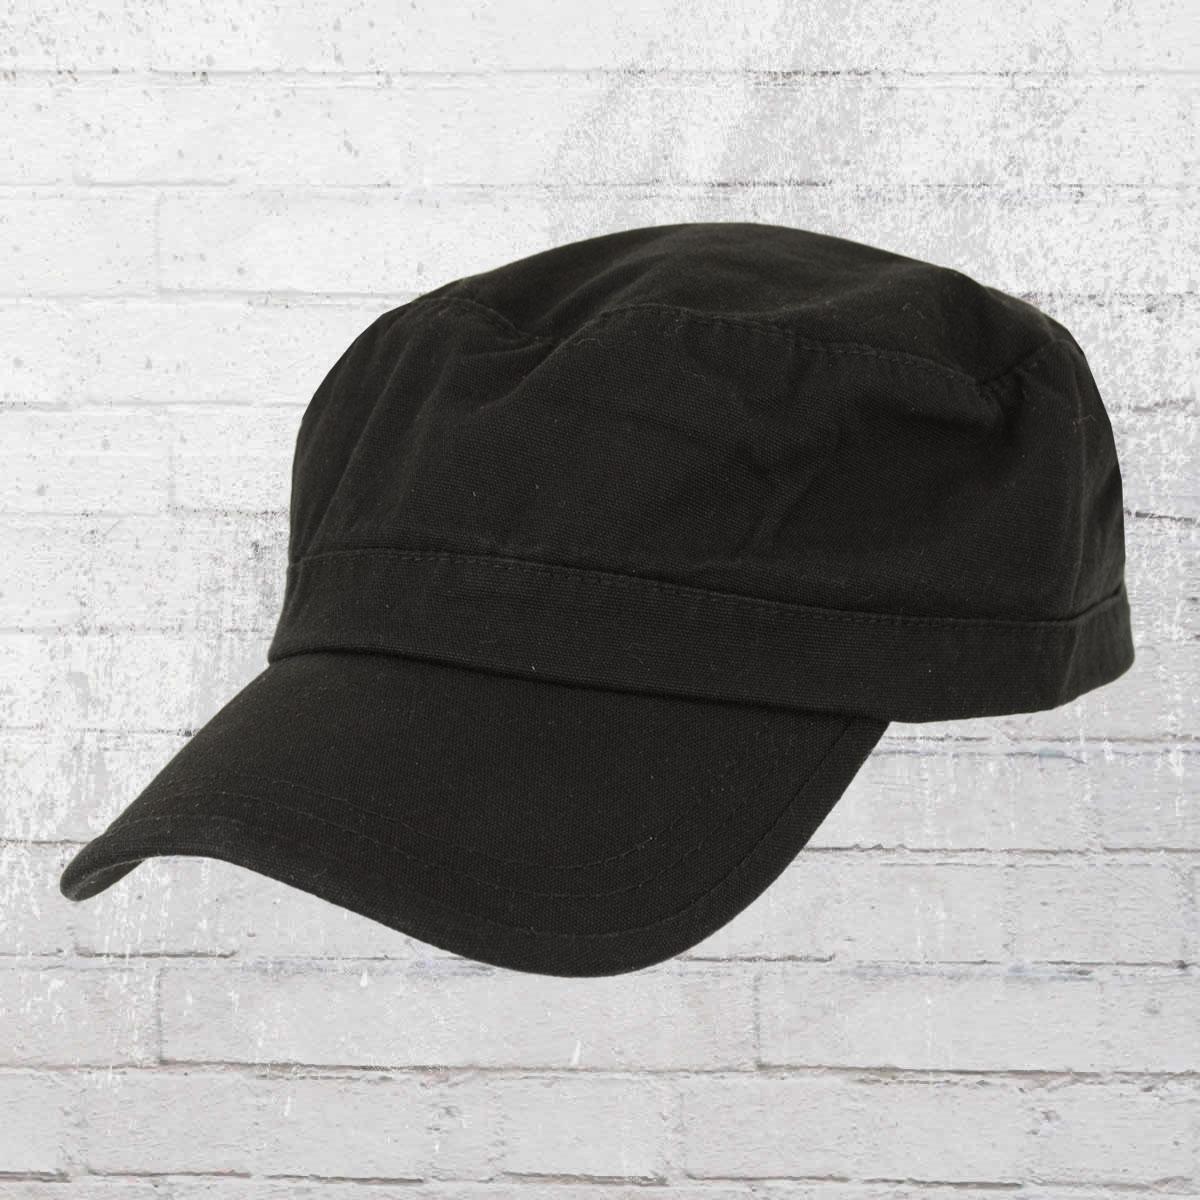 261560d54a Order now | Beechfield Bonnet Army Cap Top Gun Curved Military black